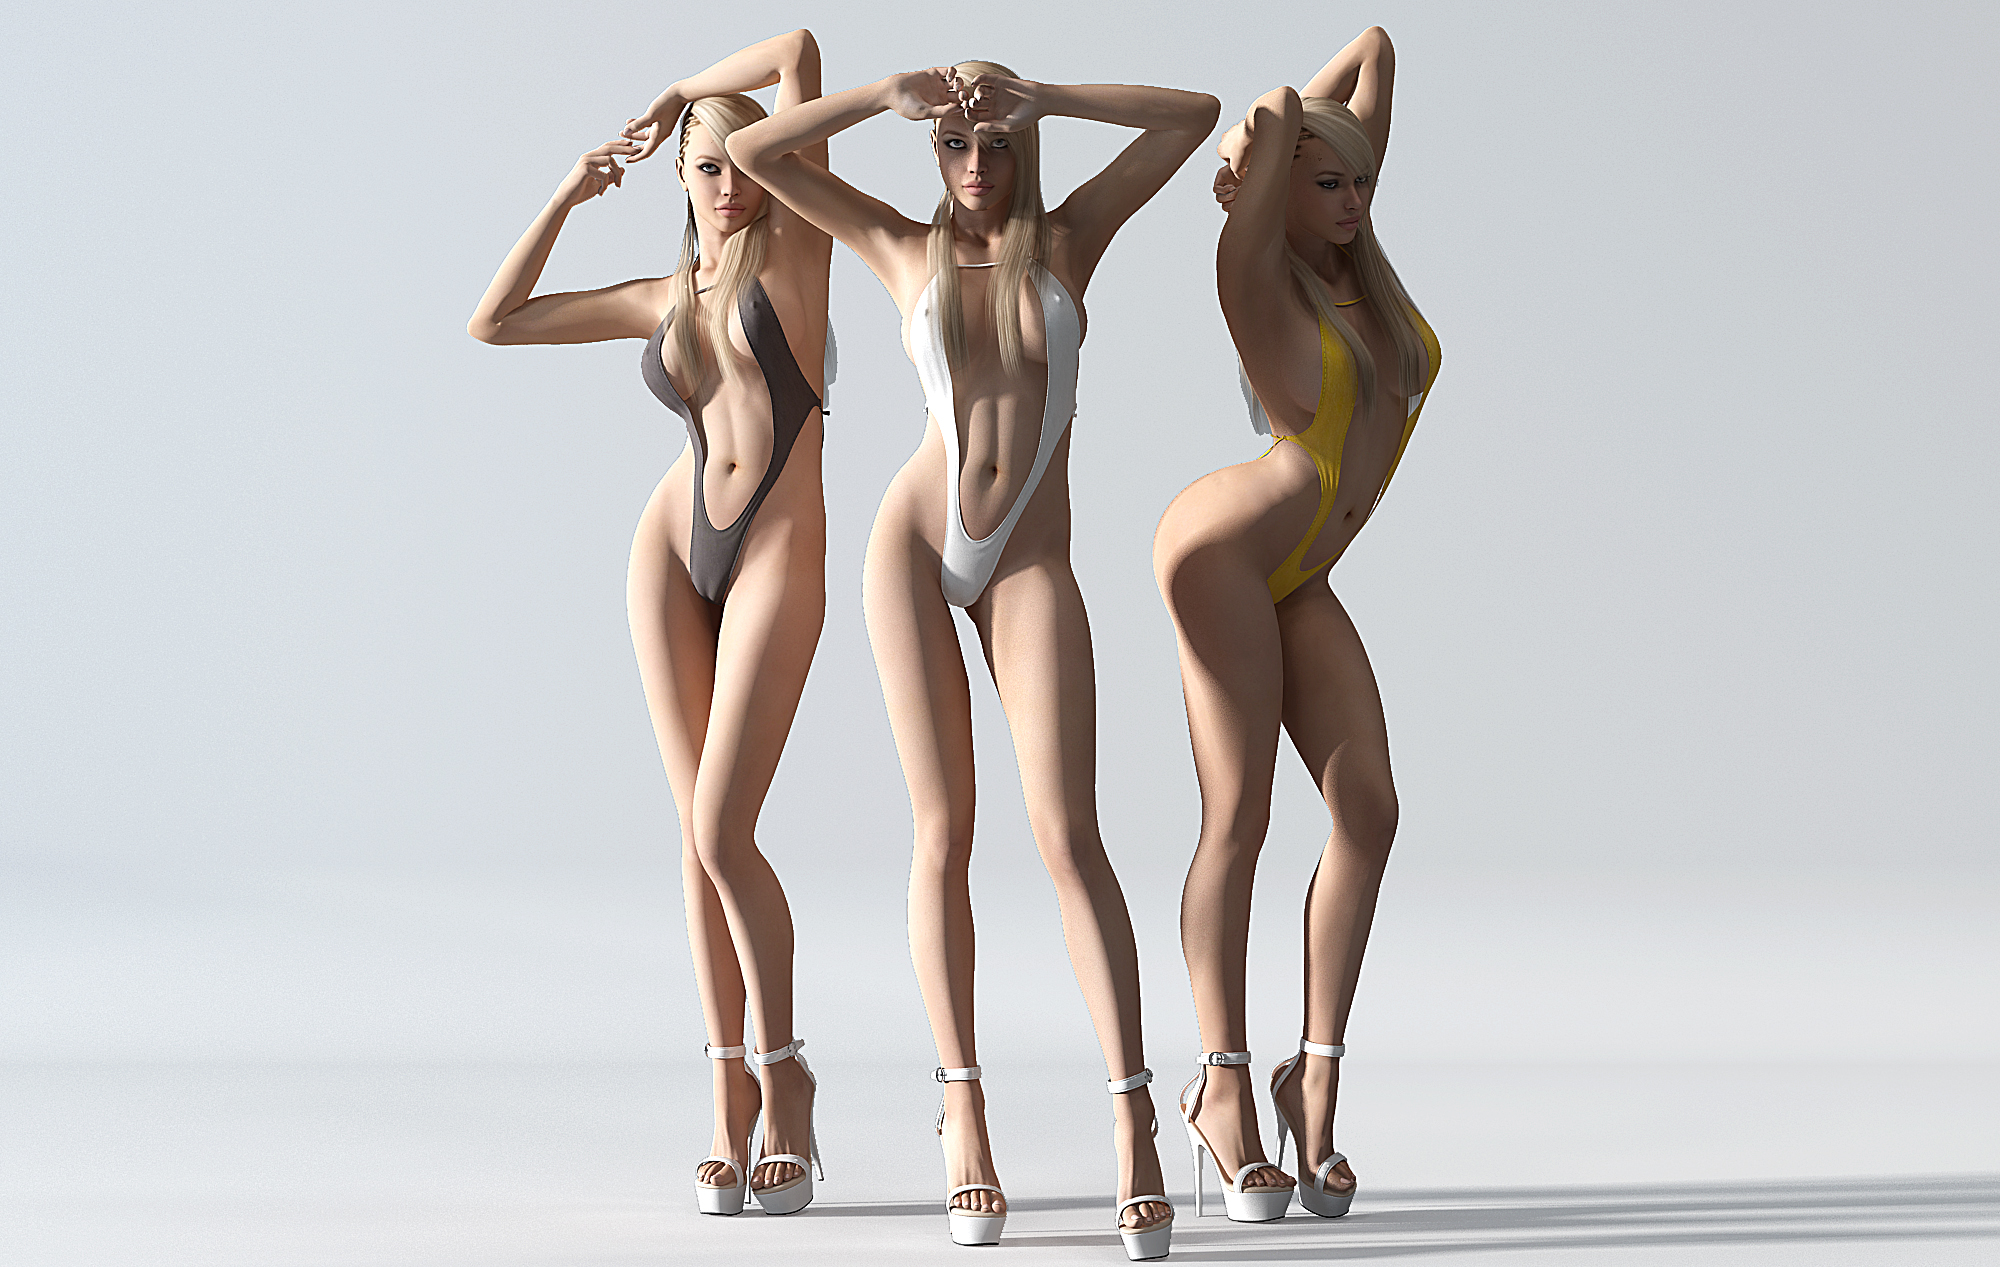 CG模型_ 现代比基尼美女人物3d模型下载